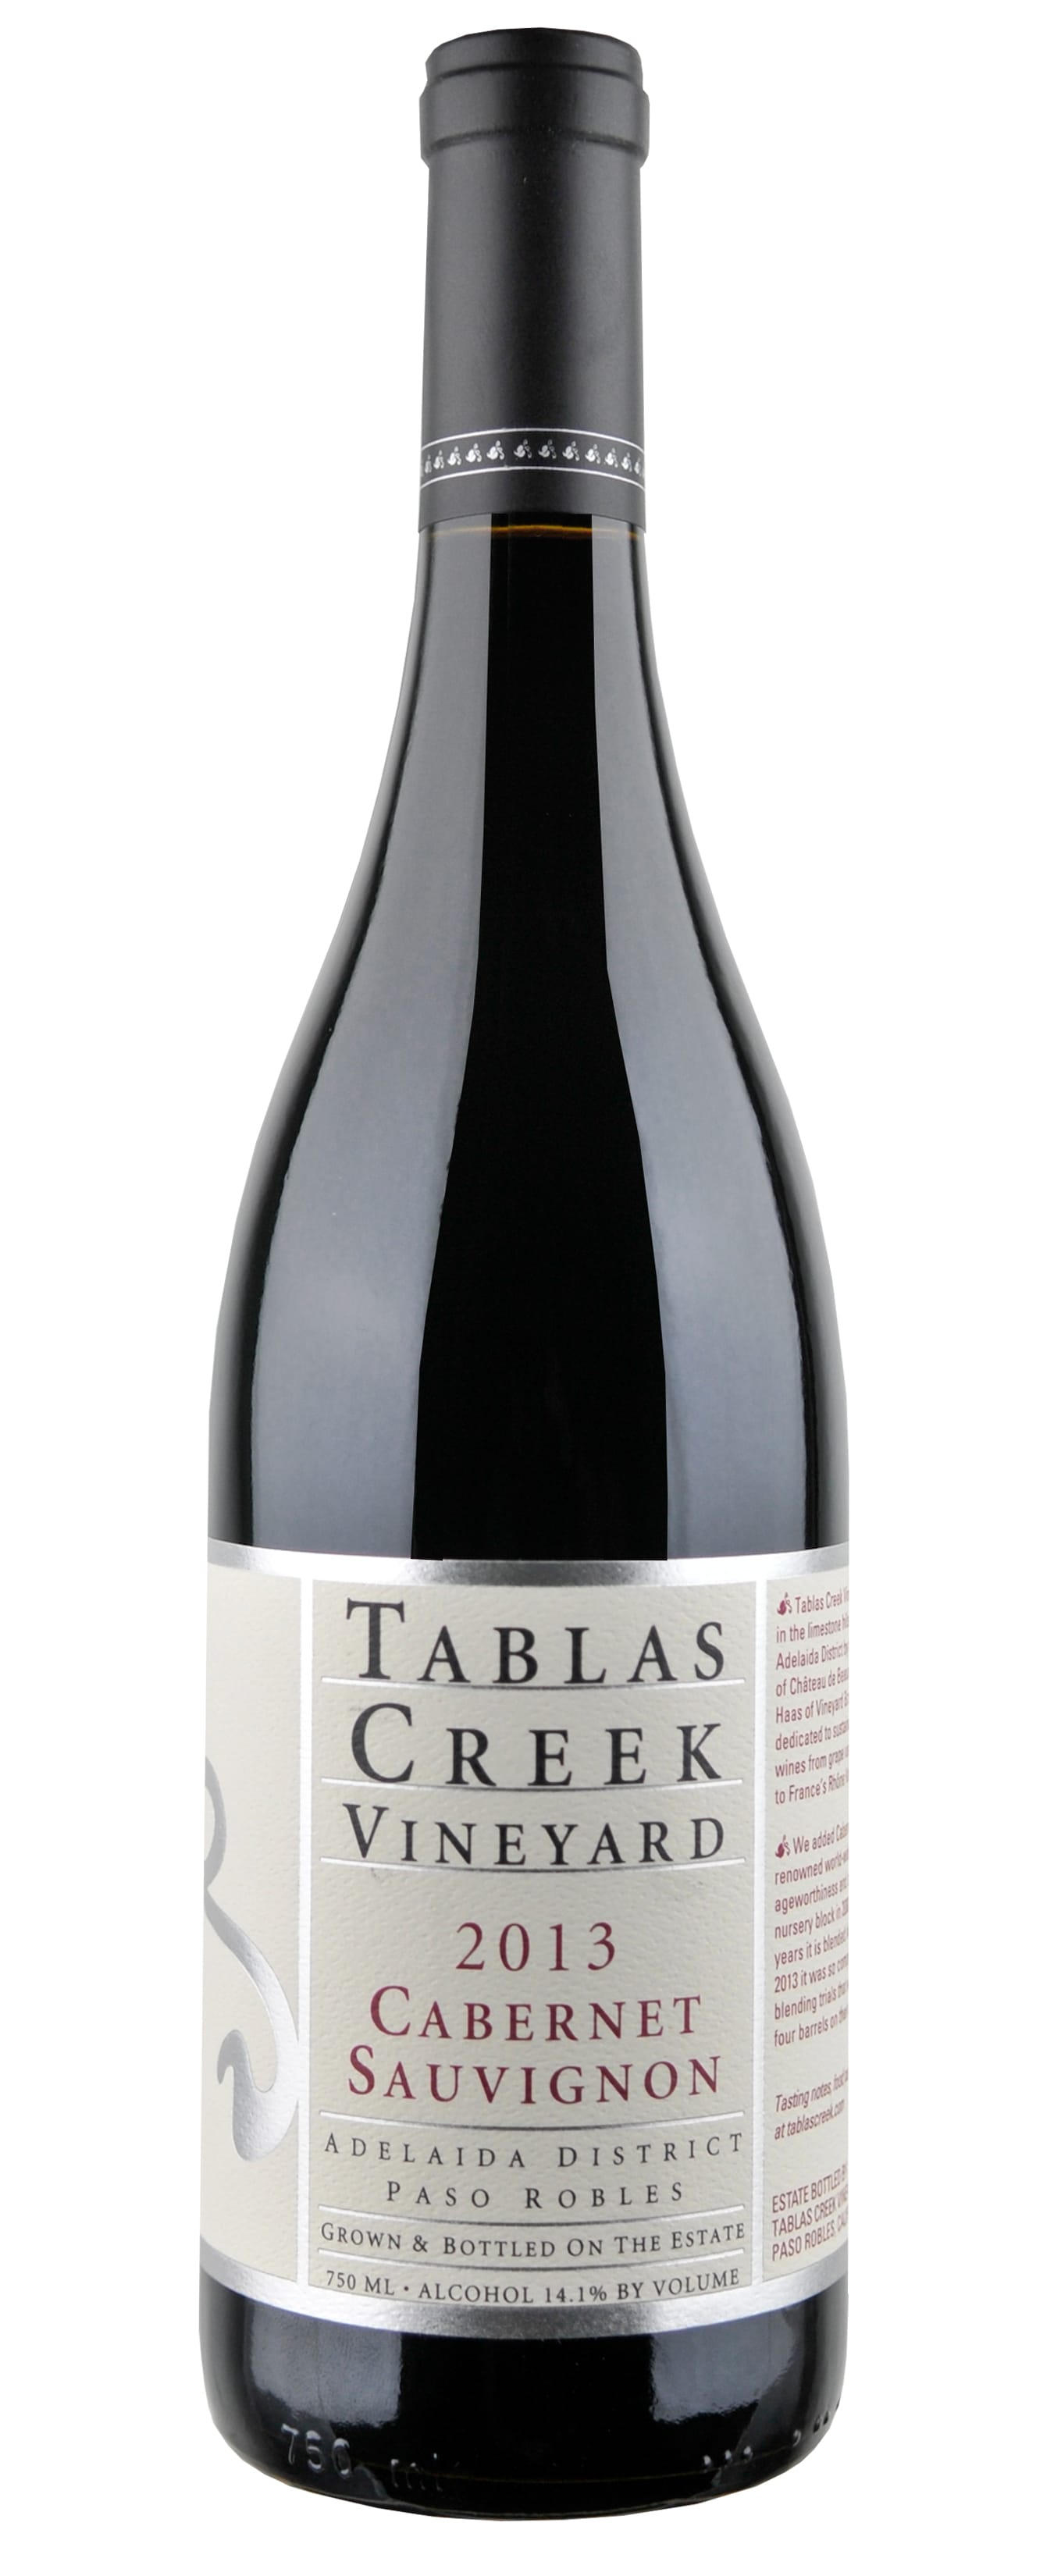 Tablas Creek Vineyard 2013 Cabernet Sauvignon